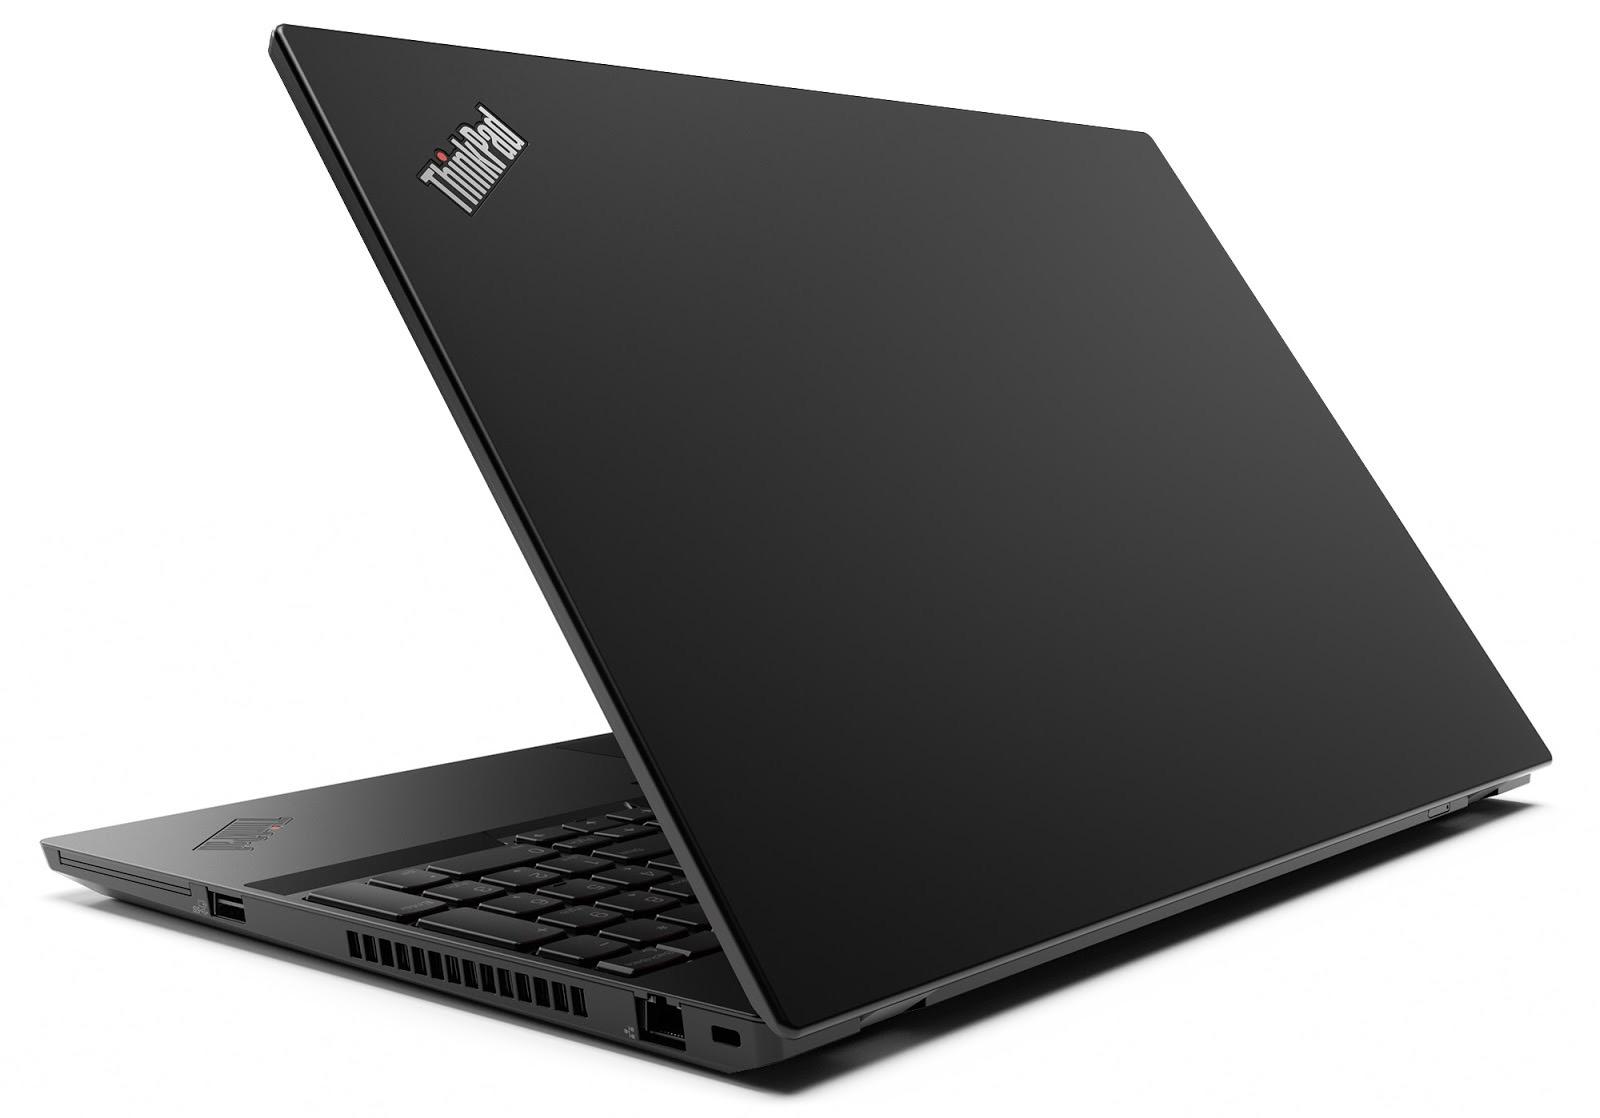 Фото 2. Ноутбук Lenovo ThinkPad T15 Gen 1 Black (20S6000NRT)